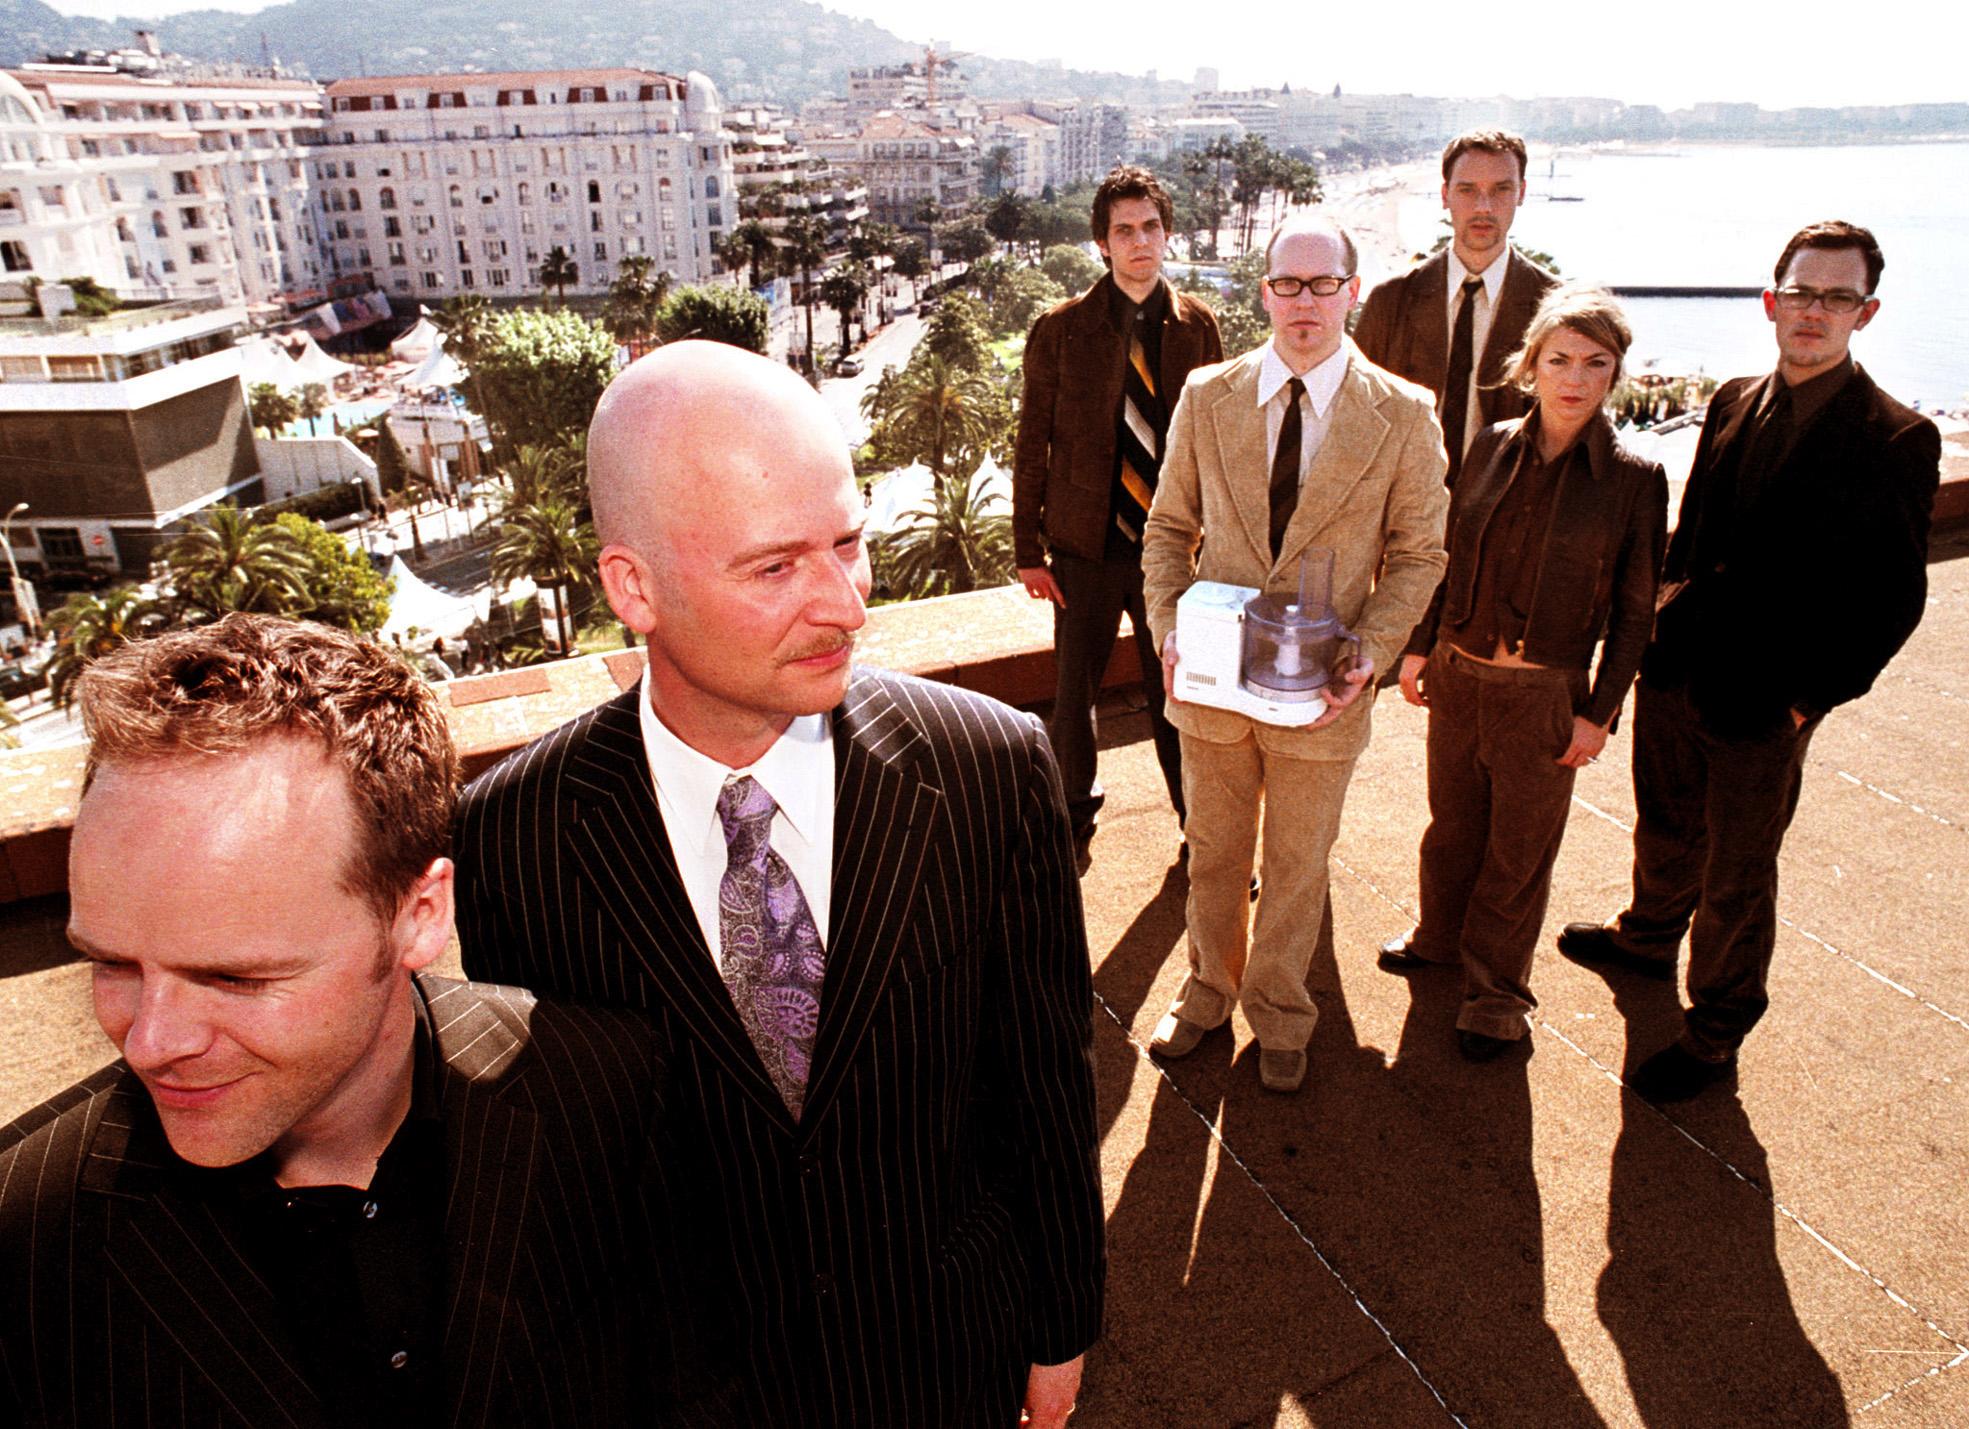 Cannes Film Festival 2001